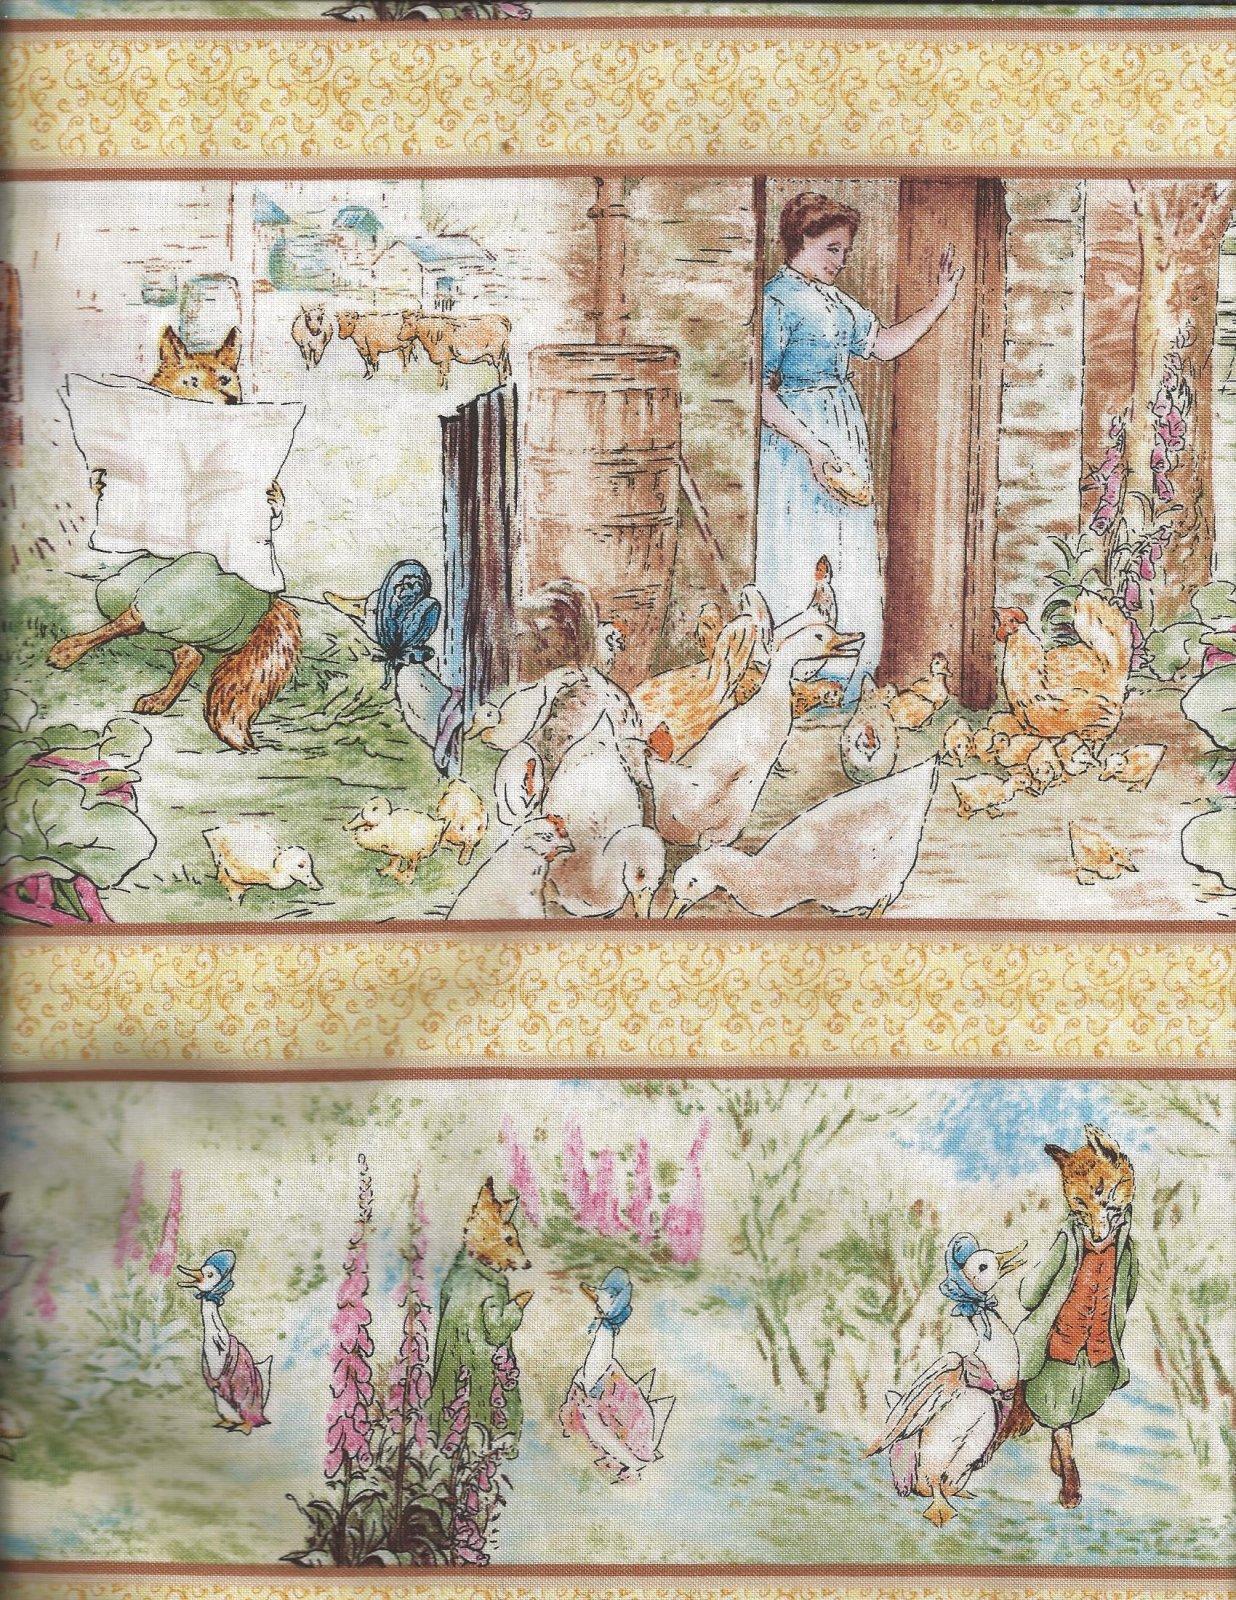 Jemima Puddle Duck, Beatrix Potter, Frederick Warne & Co. Quilting Treasures